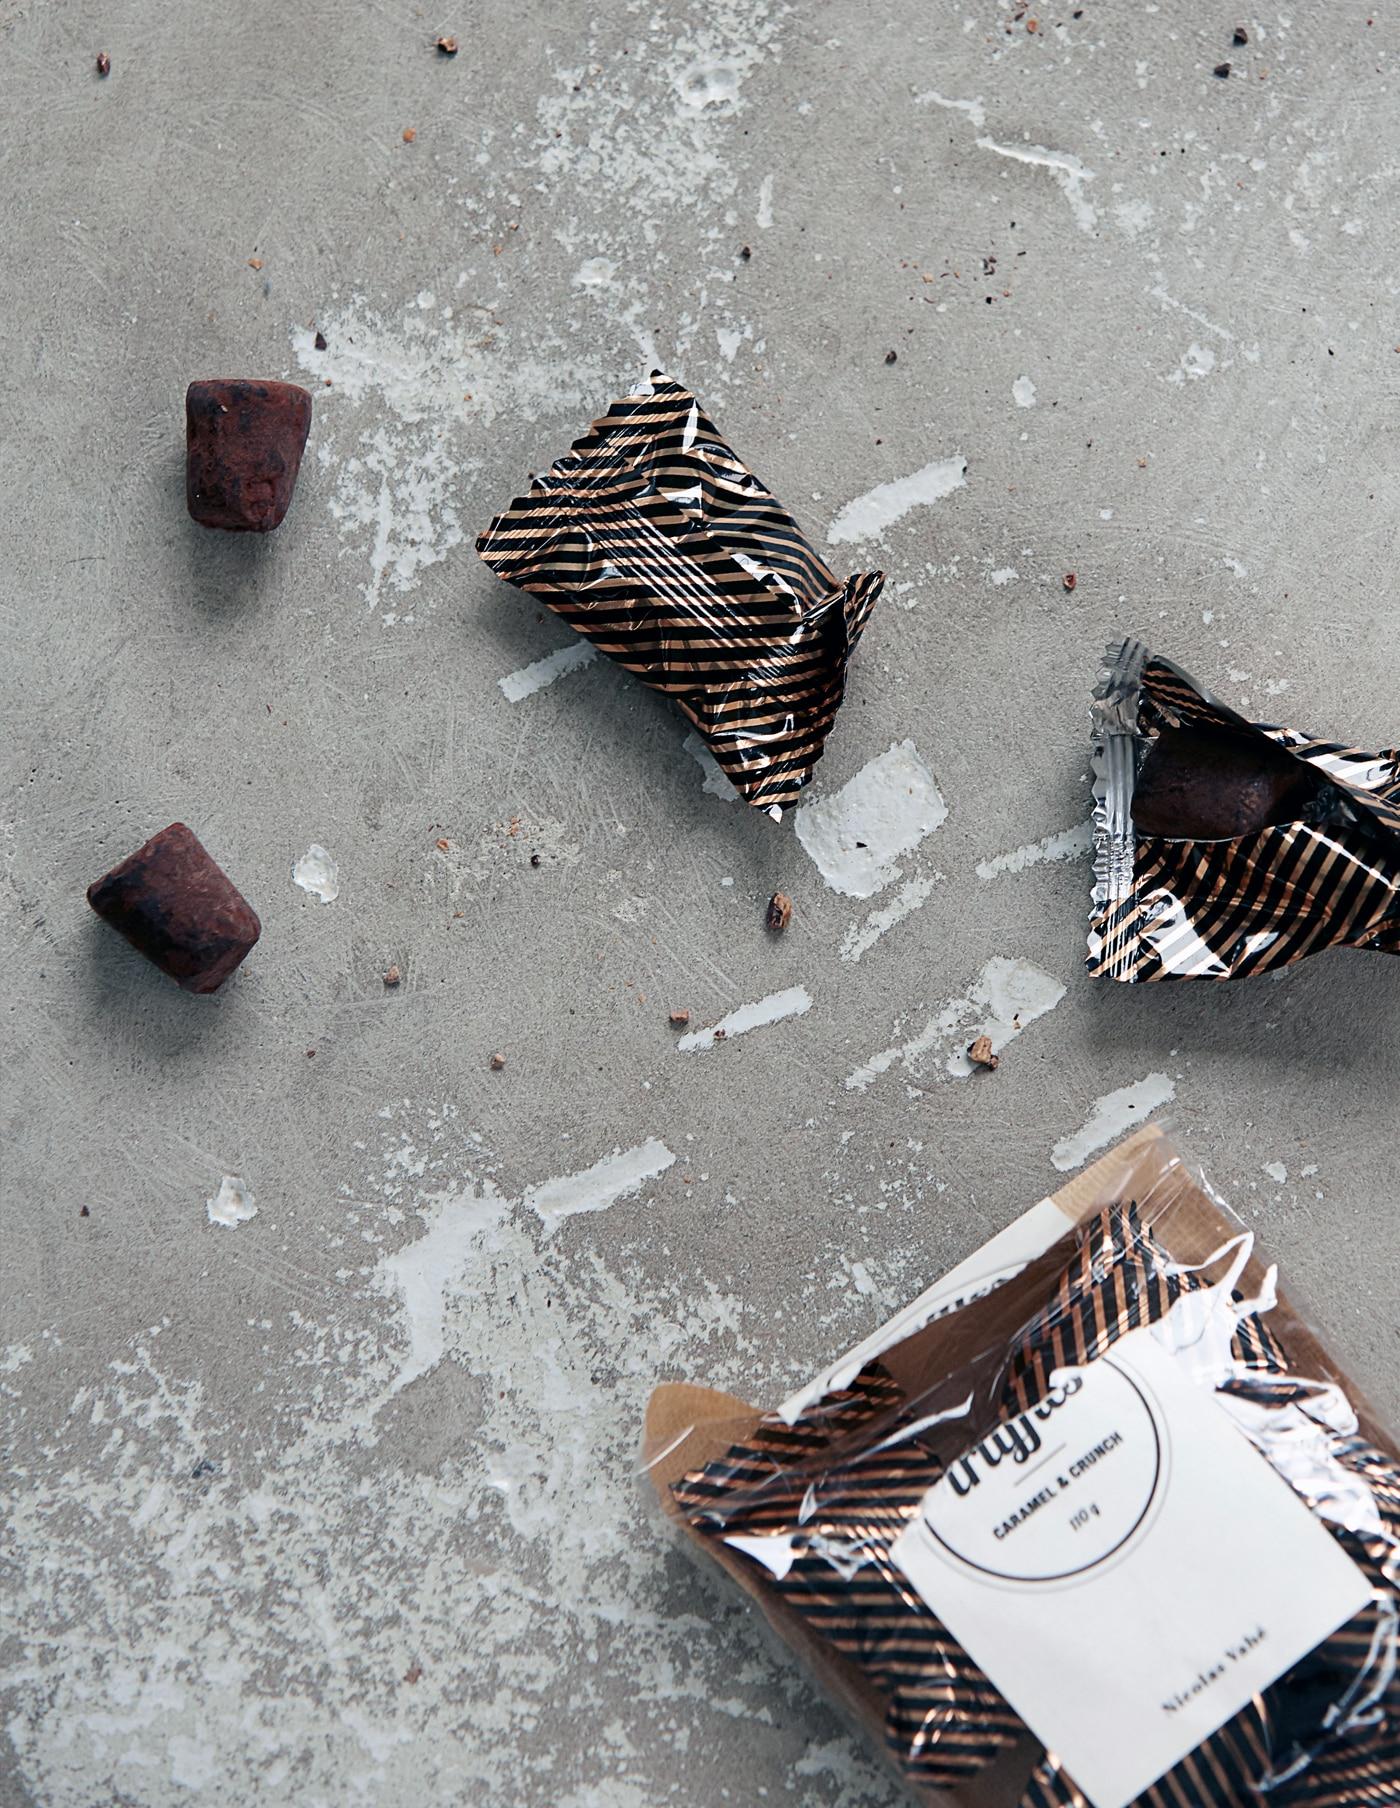 Caramel & Crunch Chocolate Truffles